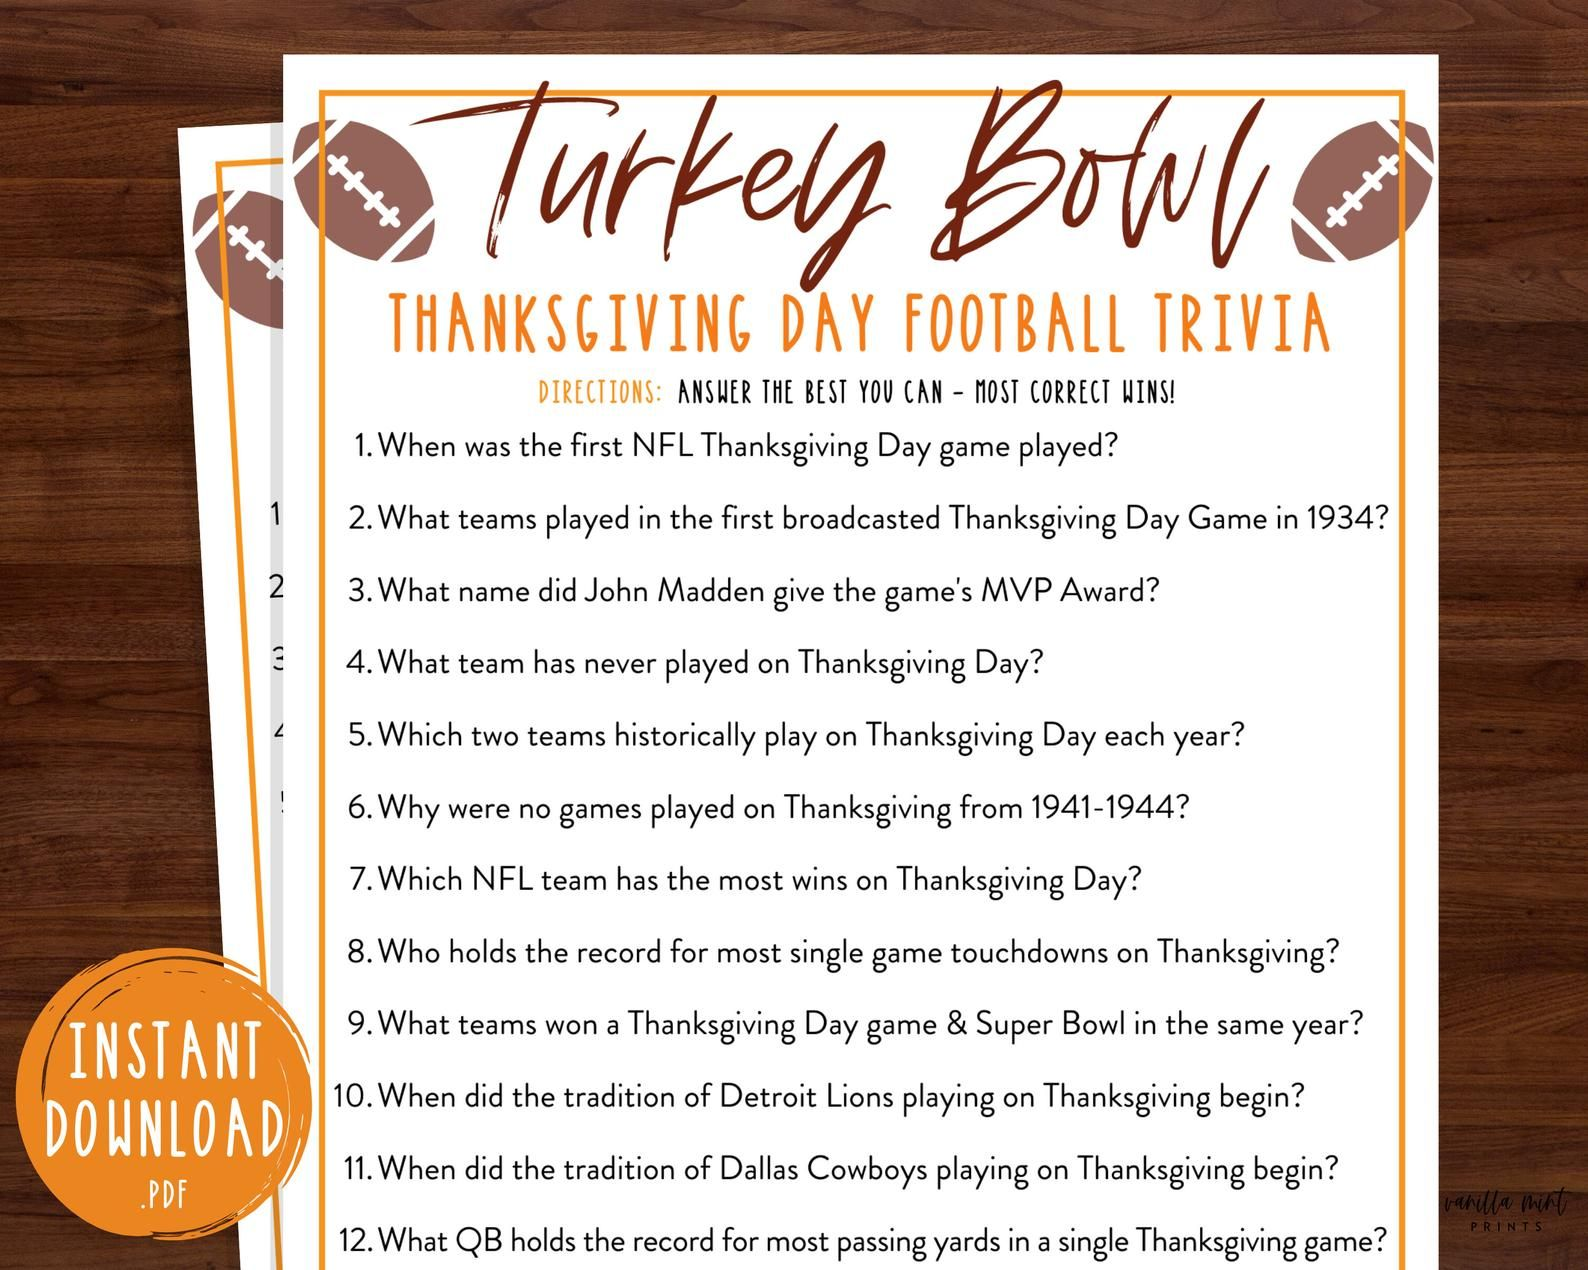 Thanksgiving Day Football Trivia Game Nfl Turkey Bowl Trivia Thanksgiving Printable Games Fun Thanksgiving Trivia Game Friendsgiving In 2020 Thanksgiving Day Football Thanksgiving Facts Thanksgiving Games